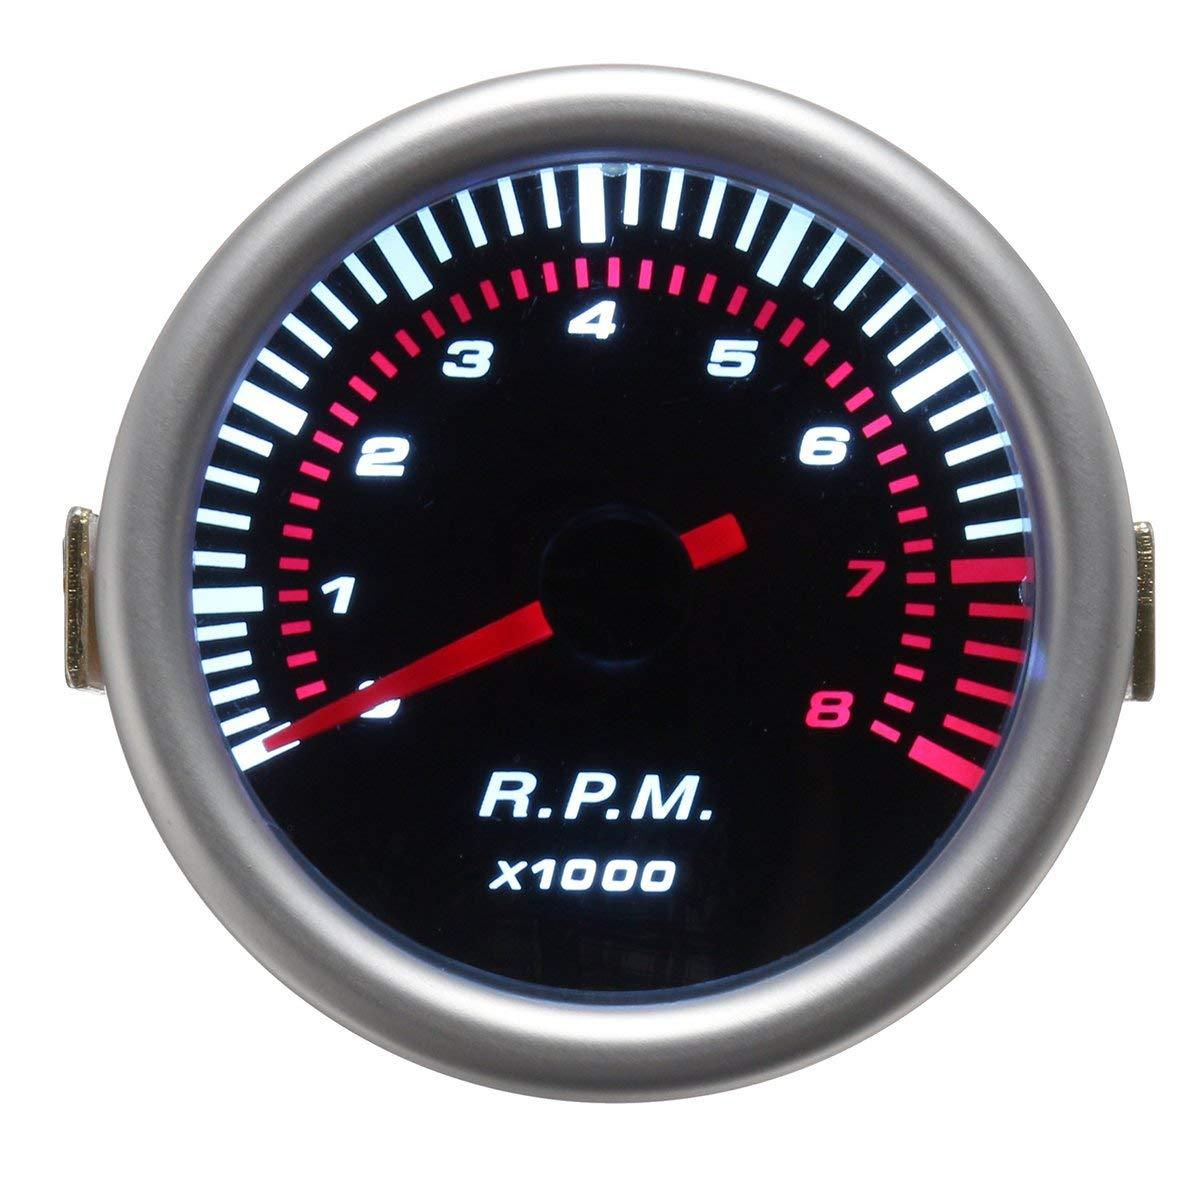 Dewhel Smoke 7-Colors LED 2 52mm 12V Tachometer Rev Counter RPM 0-8000 Tacho Meters Pointer Universal